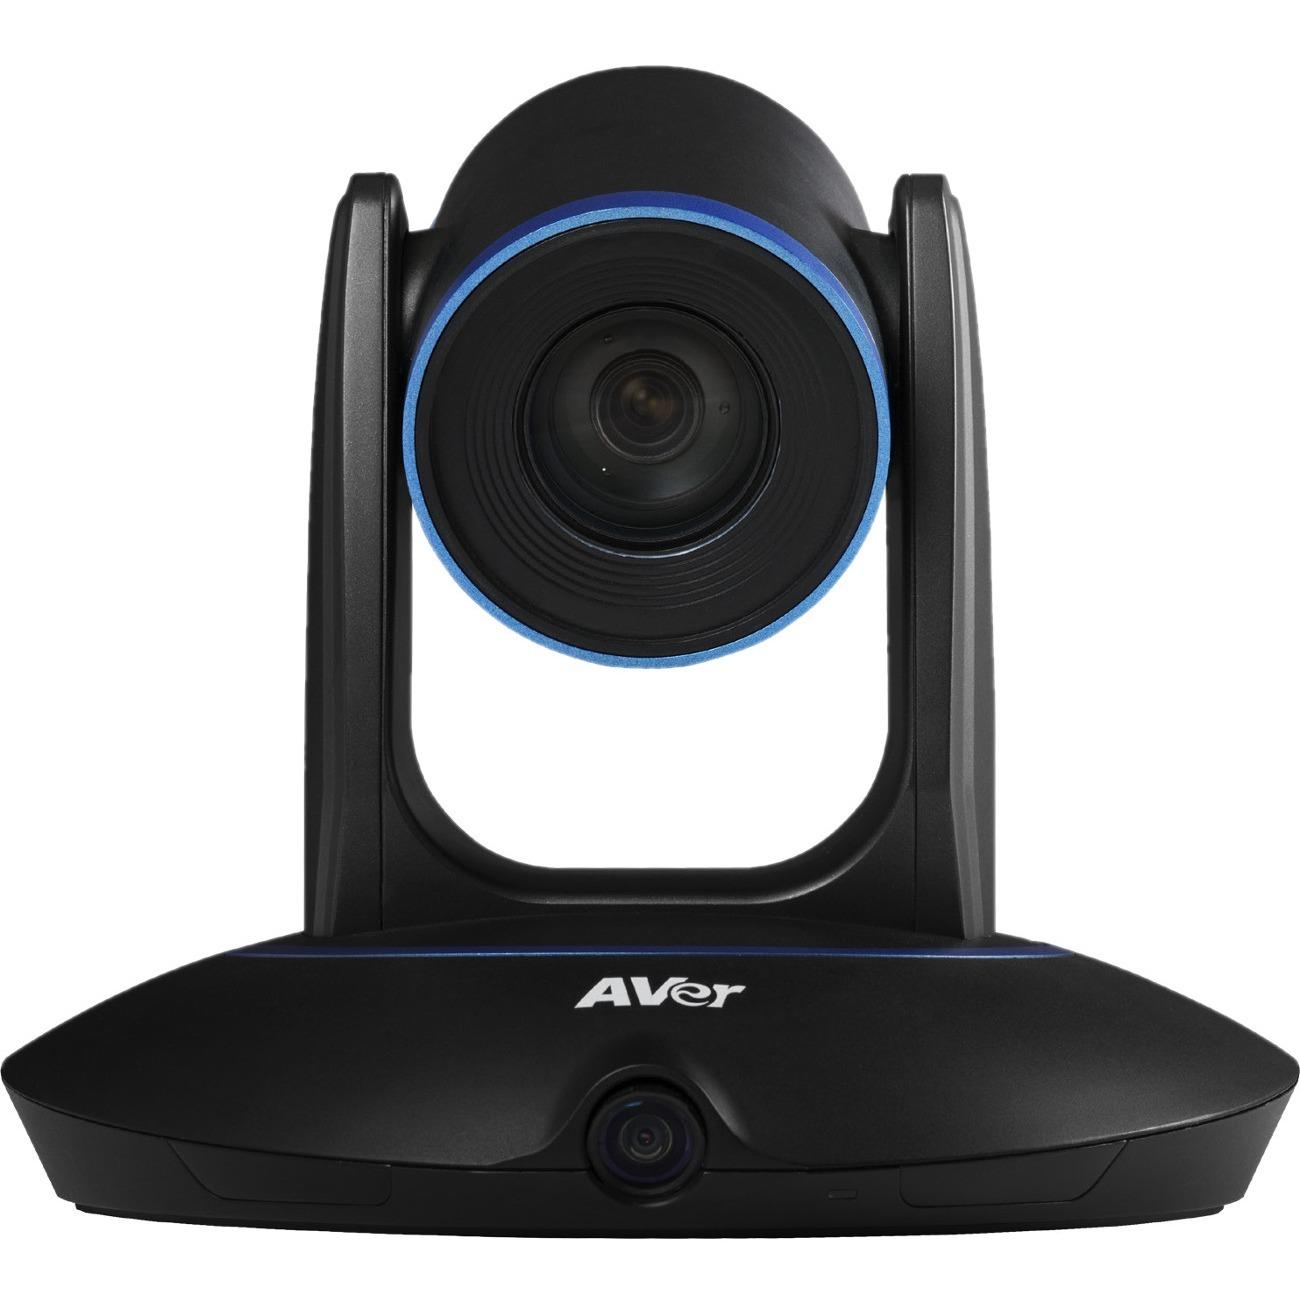 AVer TR530 Video Conferencing Camera - 2 Megapixel - 60 fps - TAA Compliant_subImage_1